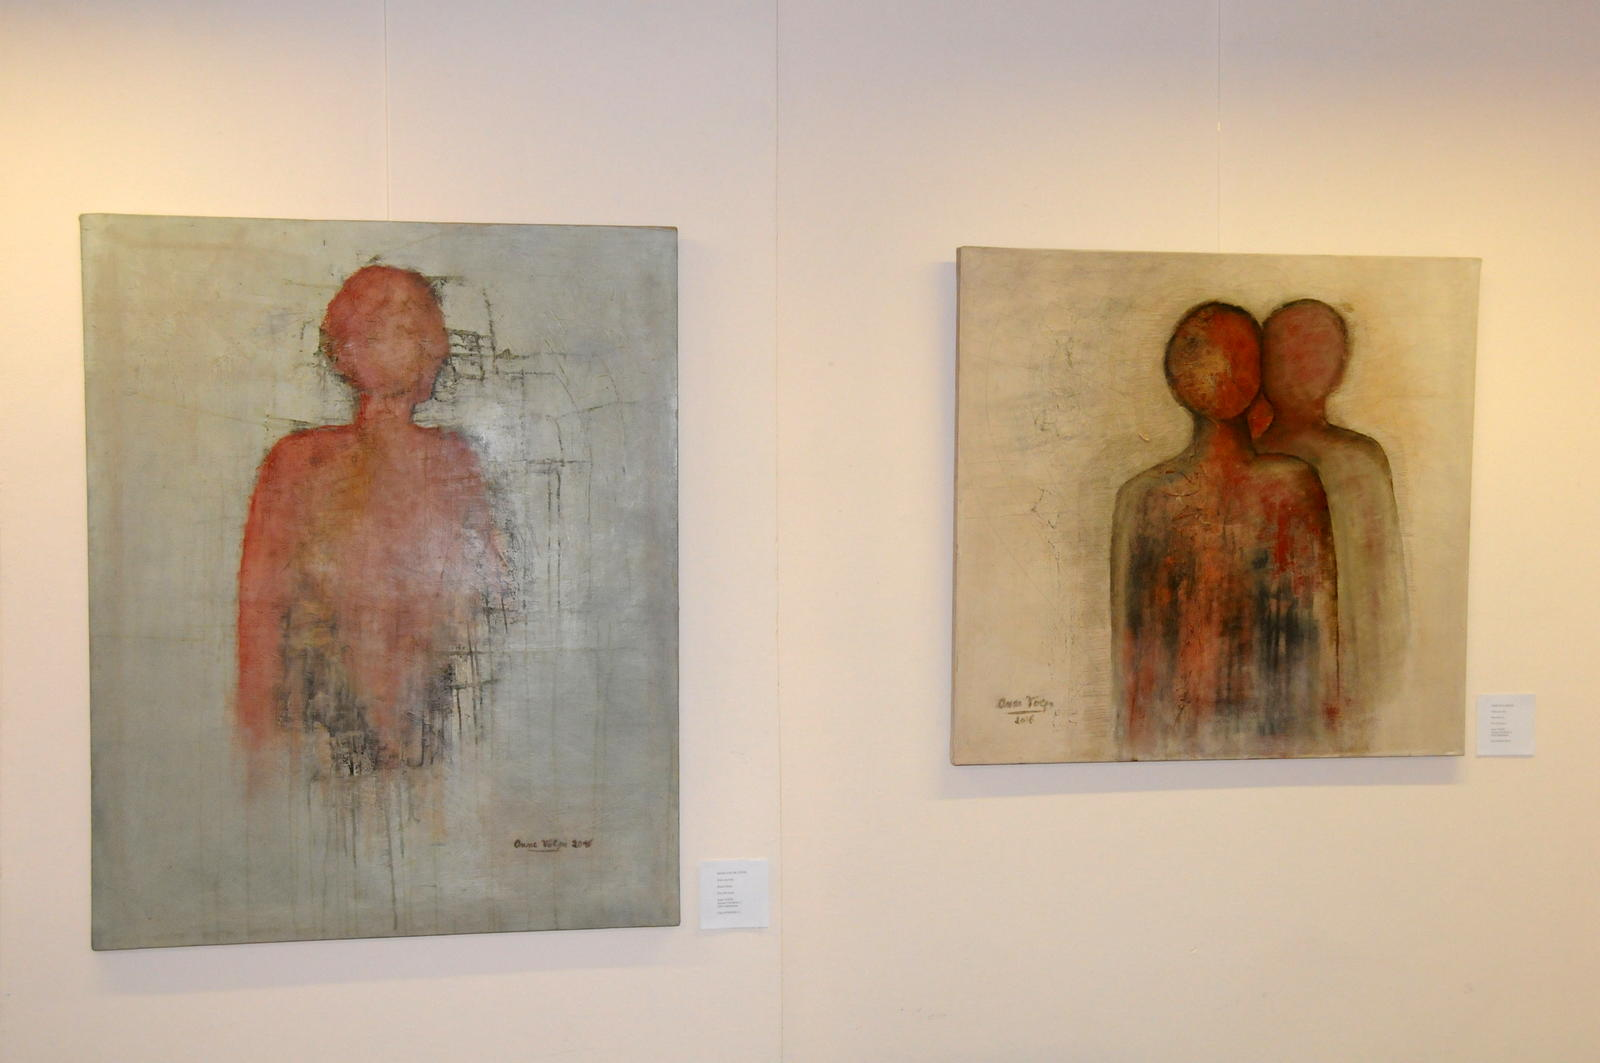 Peintures de Anne Volpe